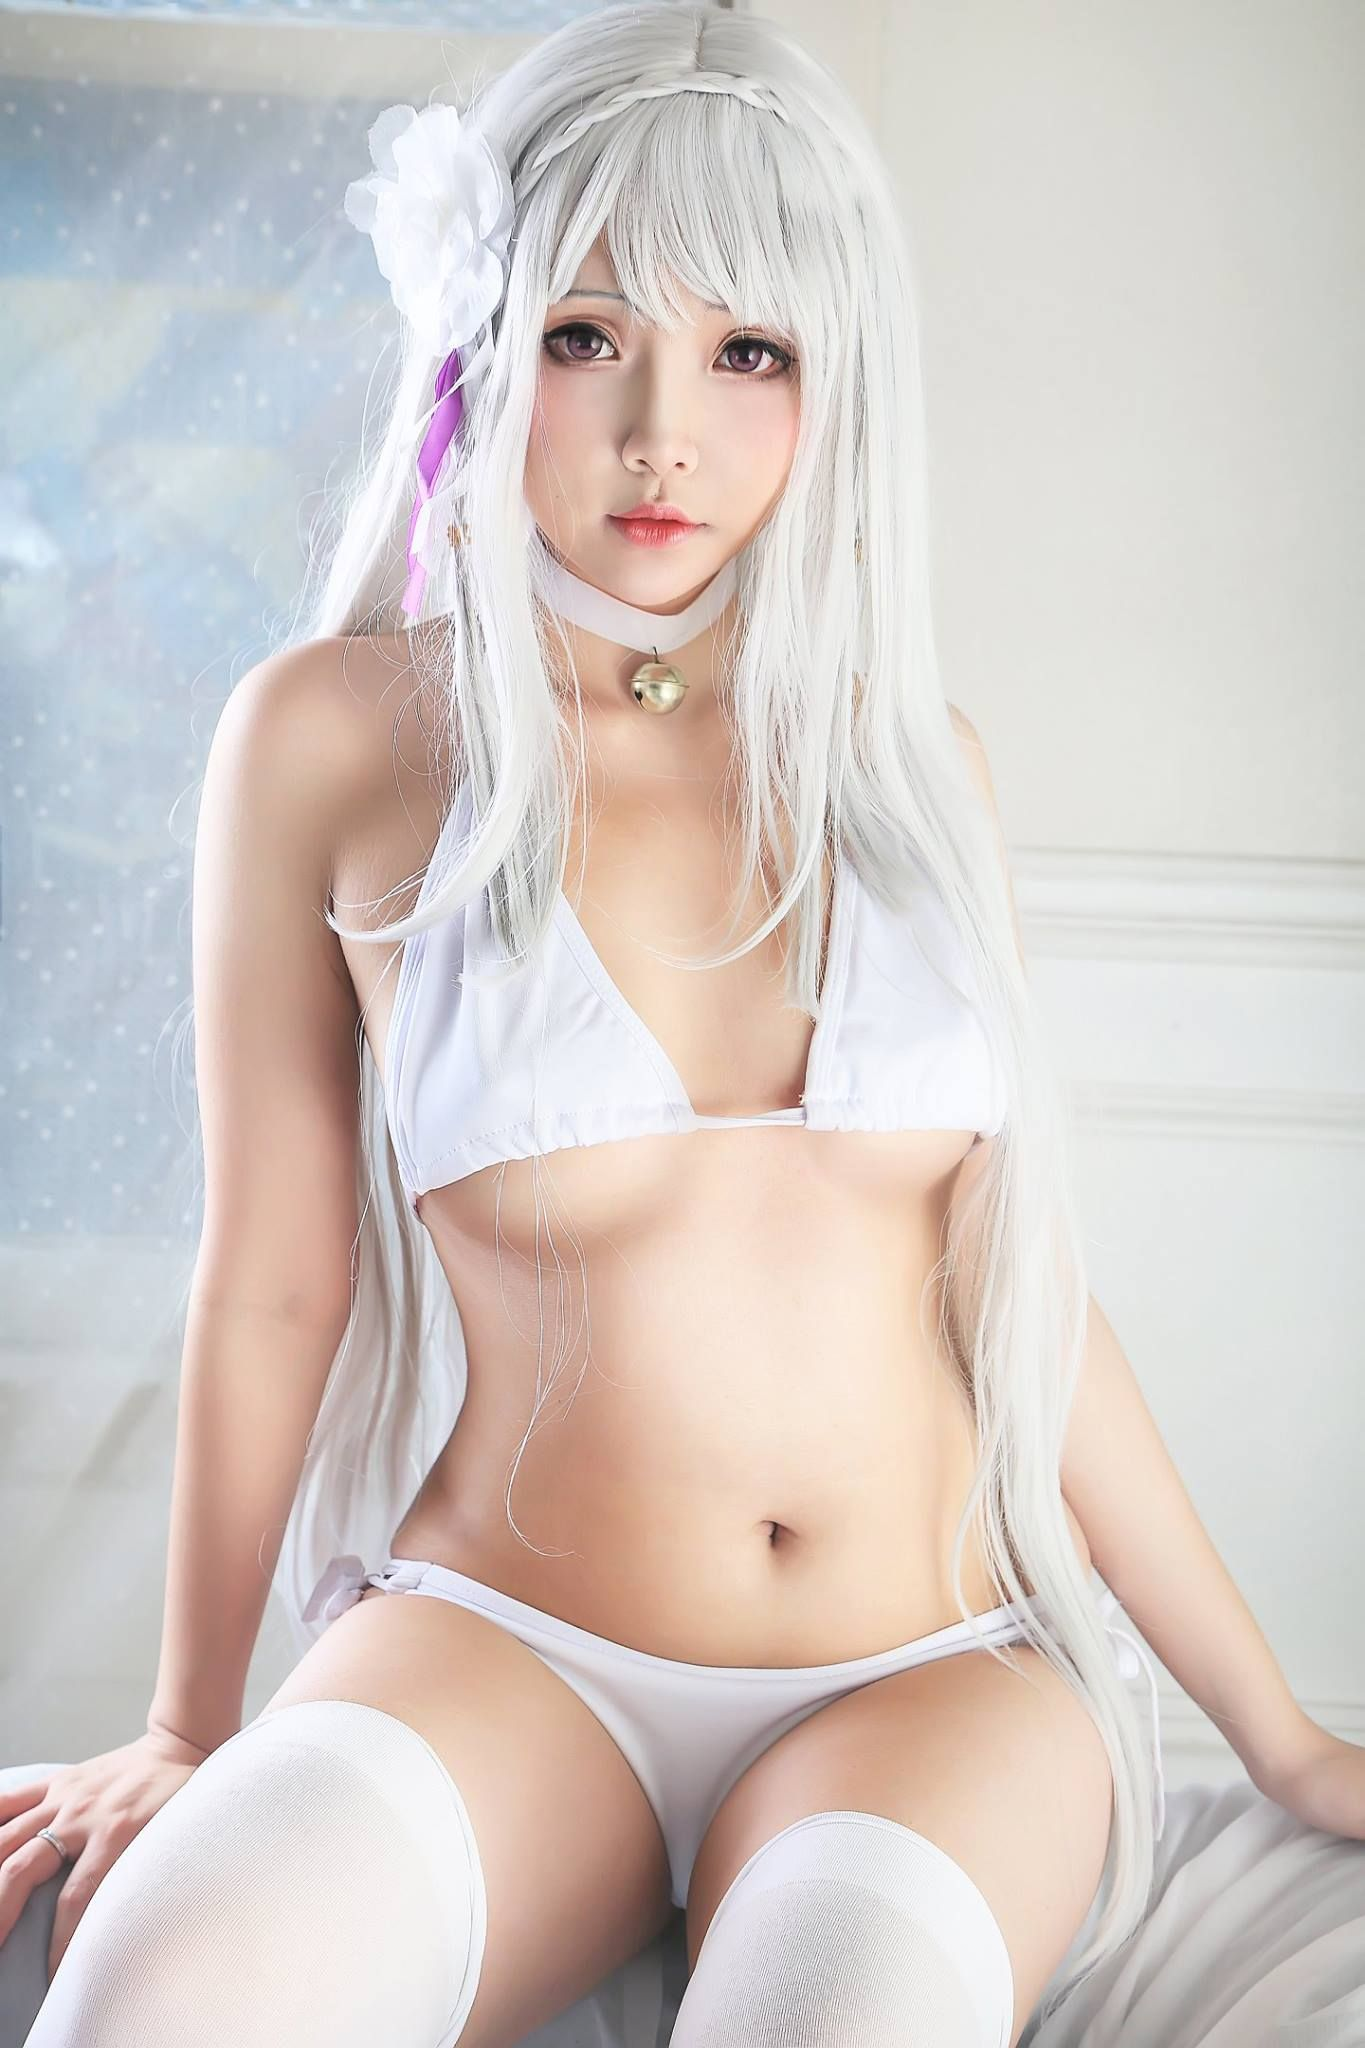 hot Asian cosplay girl